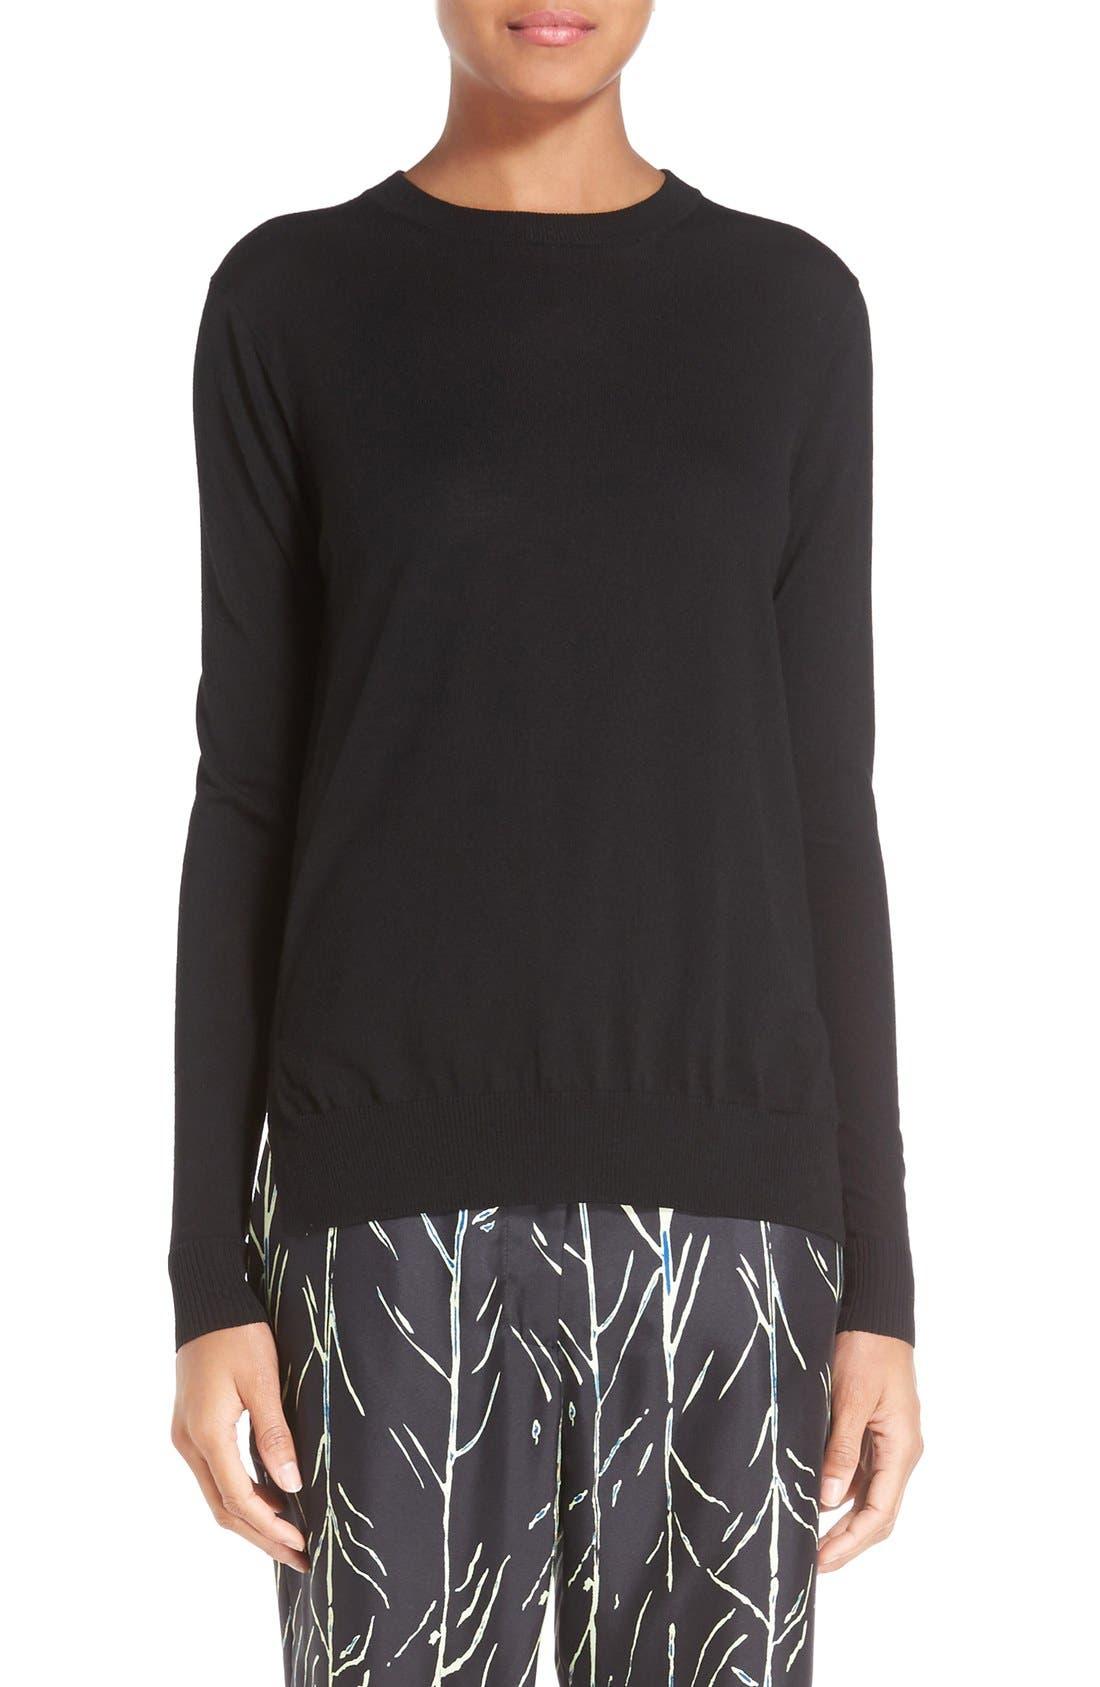 Superfine Merino Wool Sweater,                         Main,                         color, 001